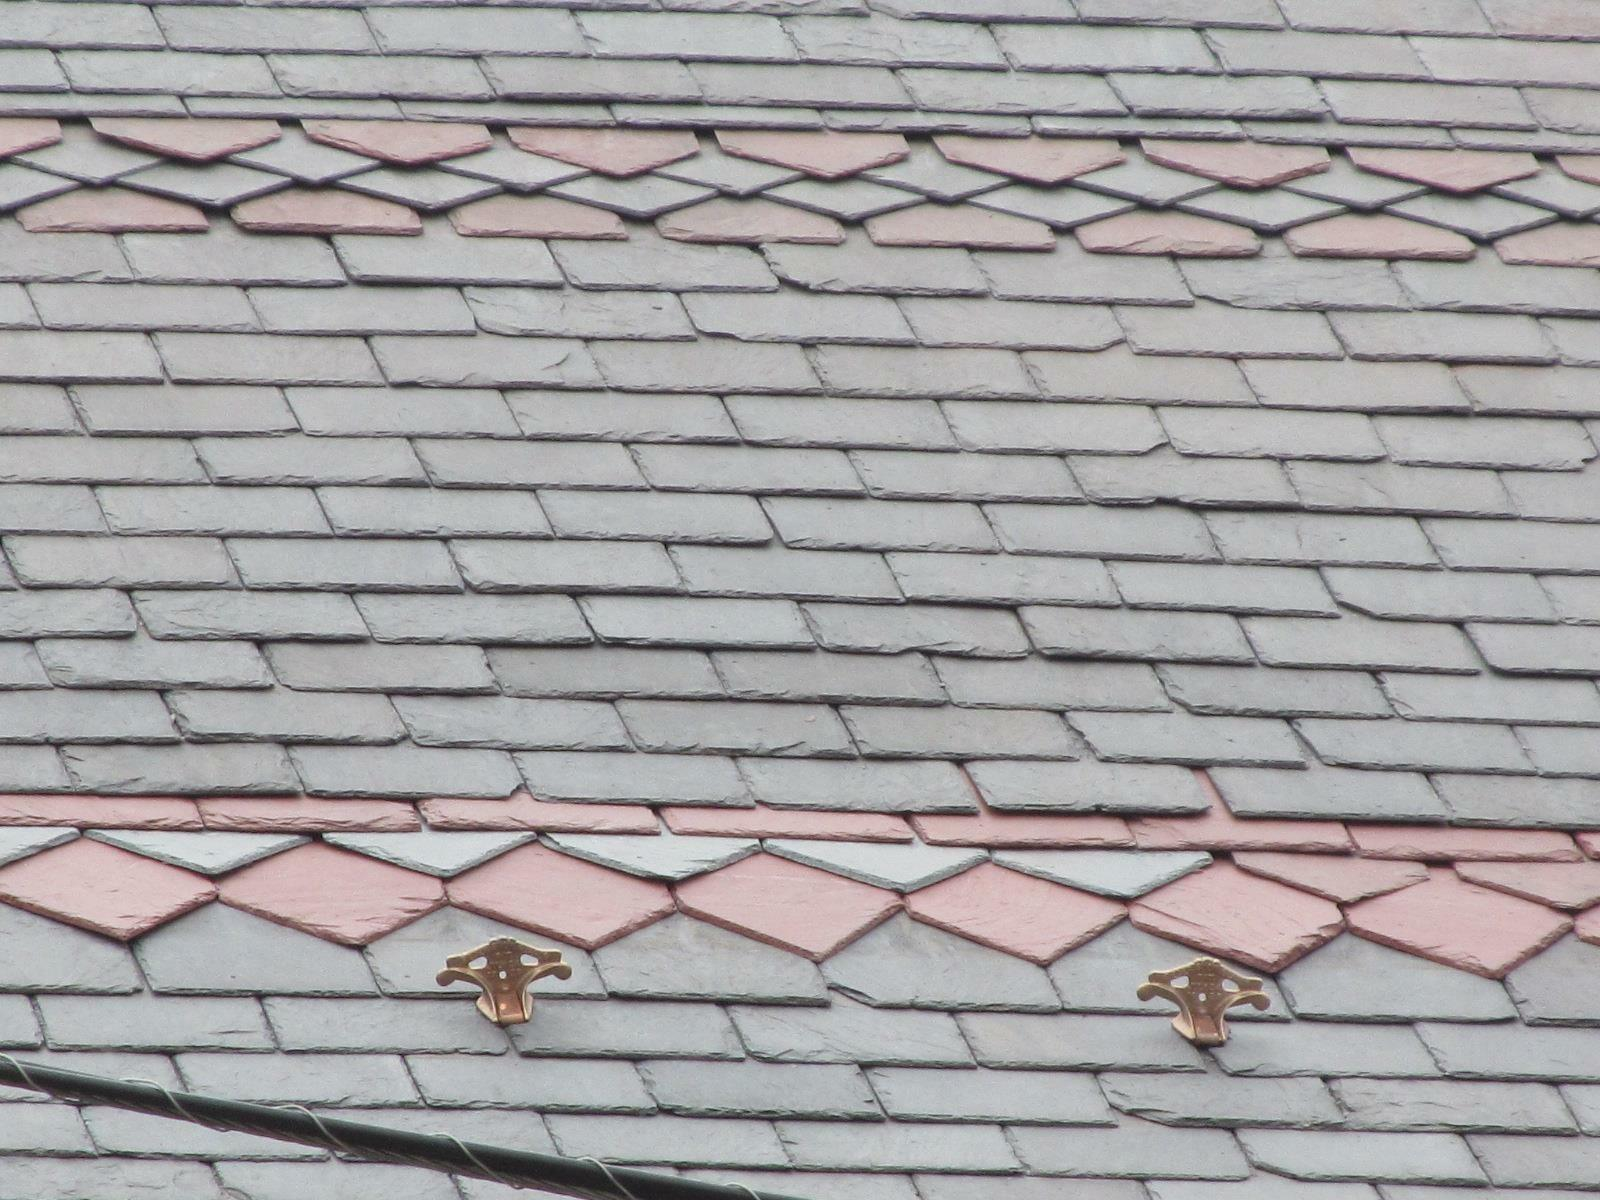 Joey Wildasin Slate Roofing image 19